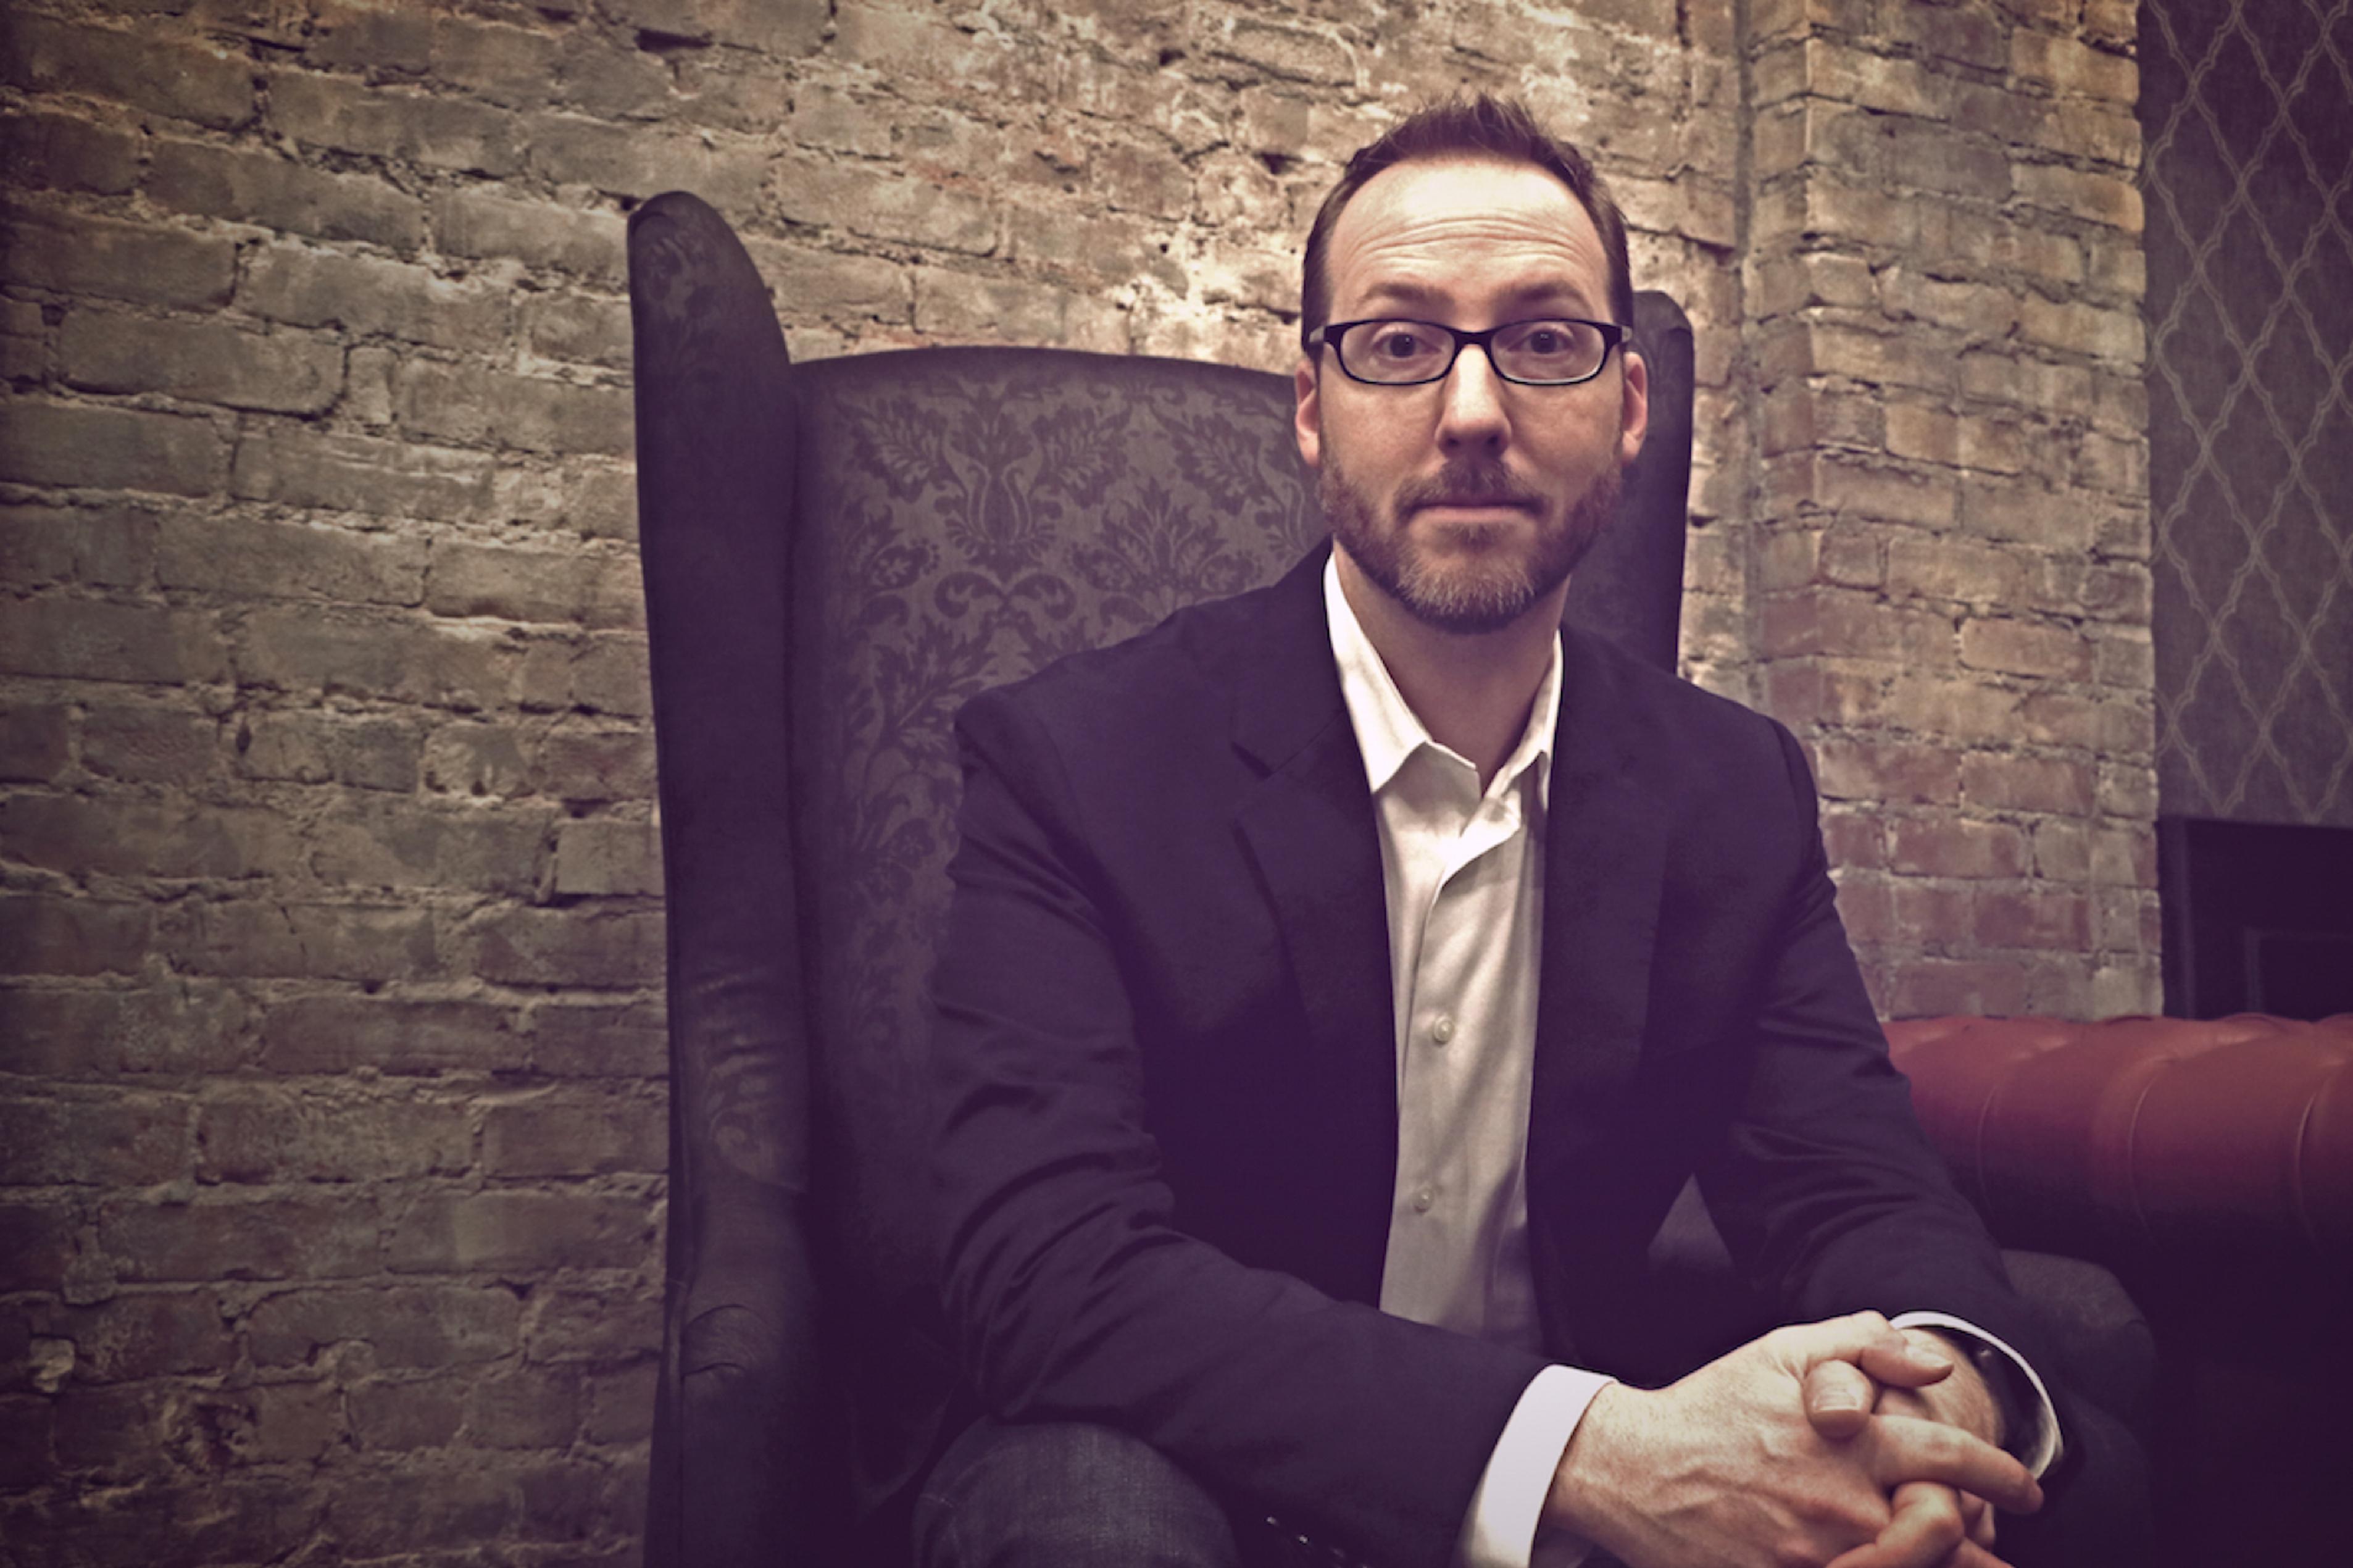 'Lore's' creator, Aaron Mahnke